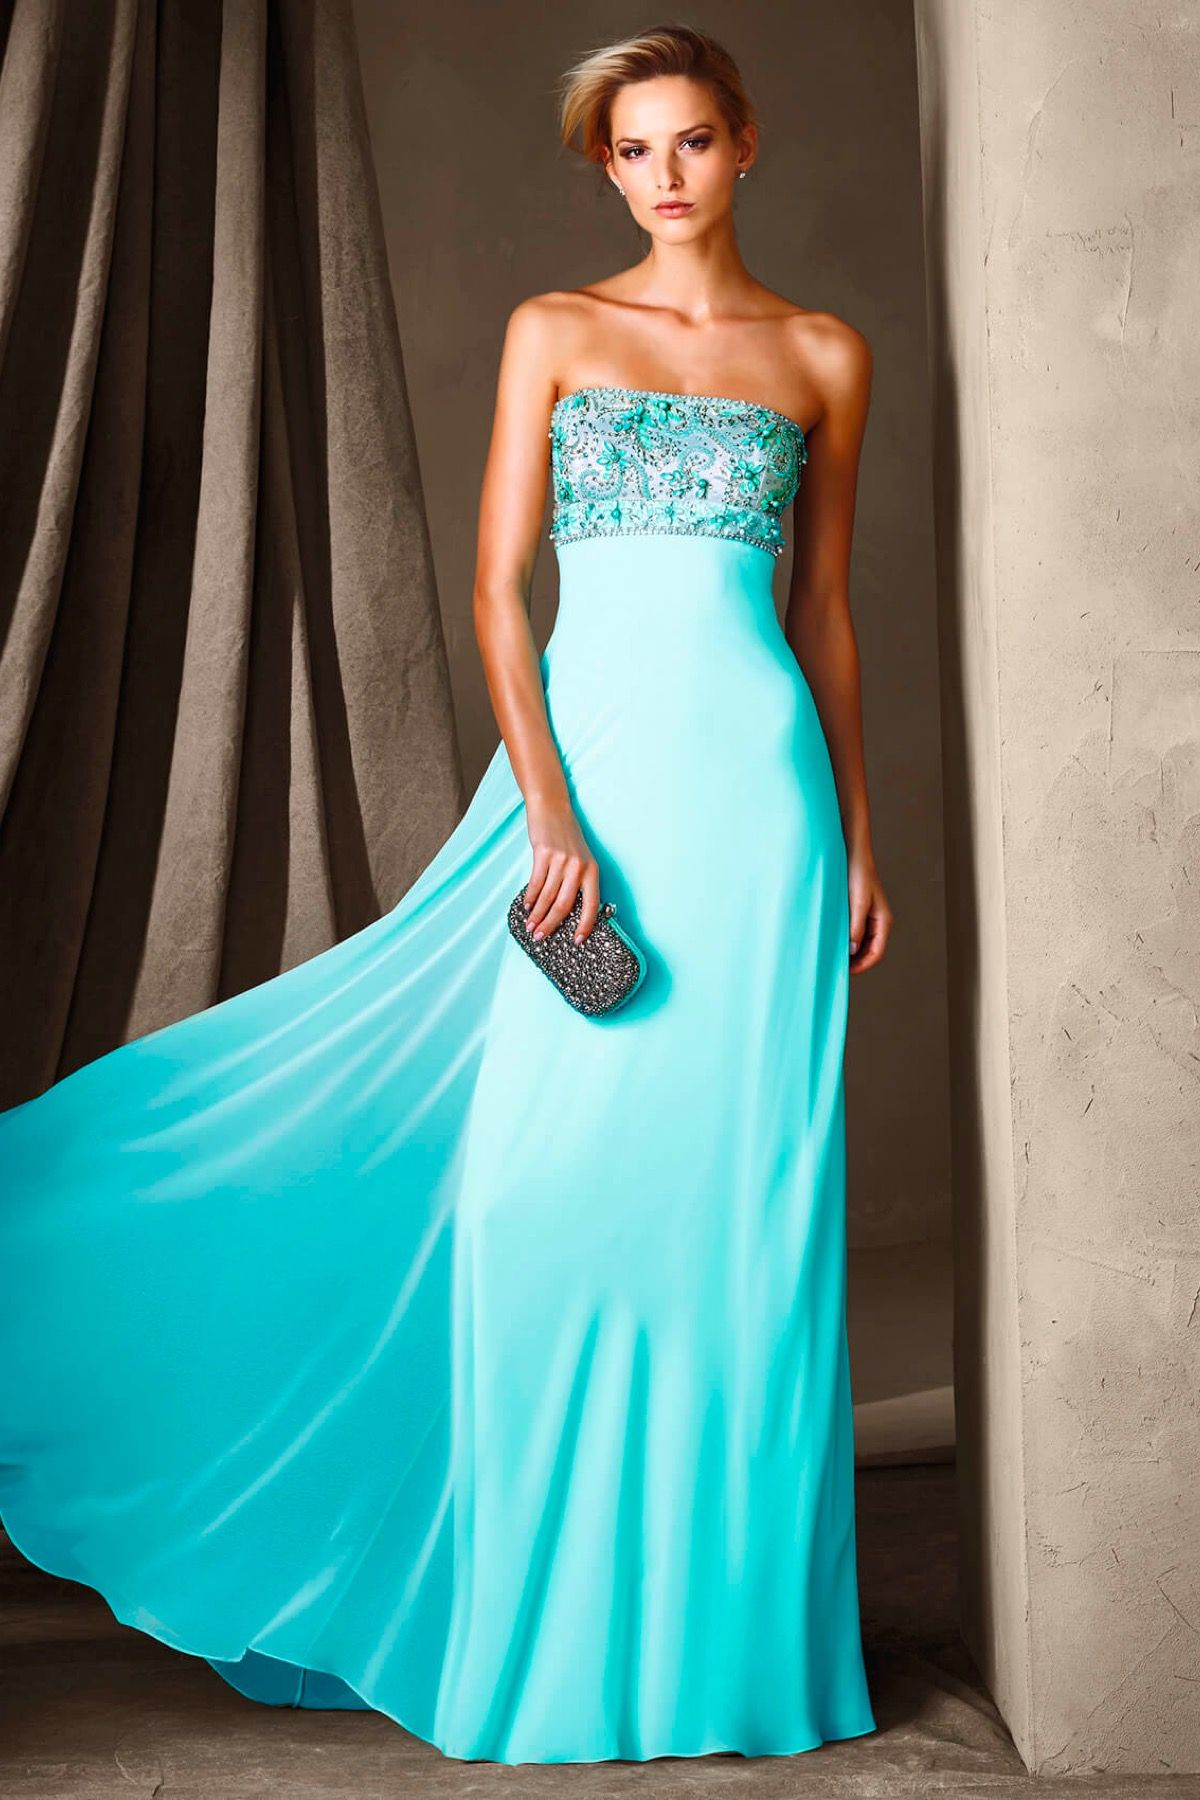 BridesmaidDresses. Style Cloette. Pronovias | Bridesmaids Dresses ...